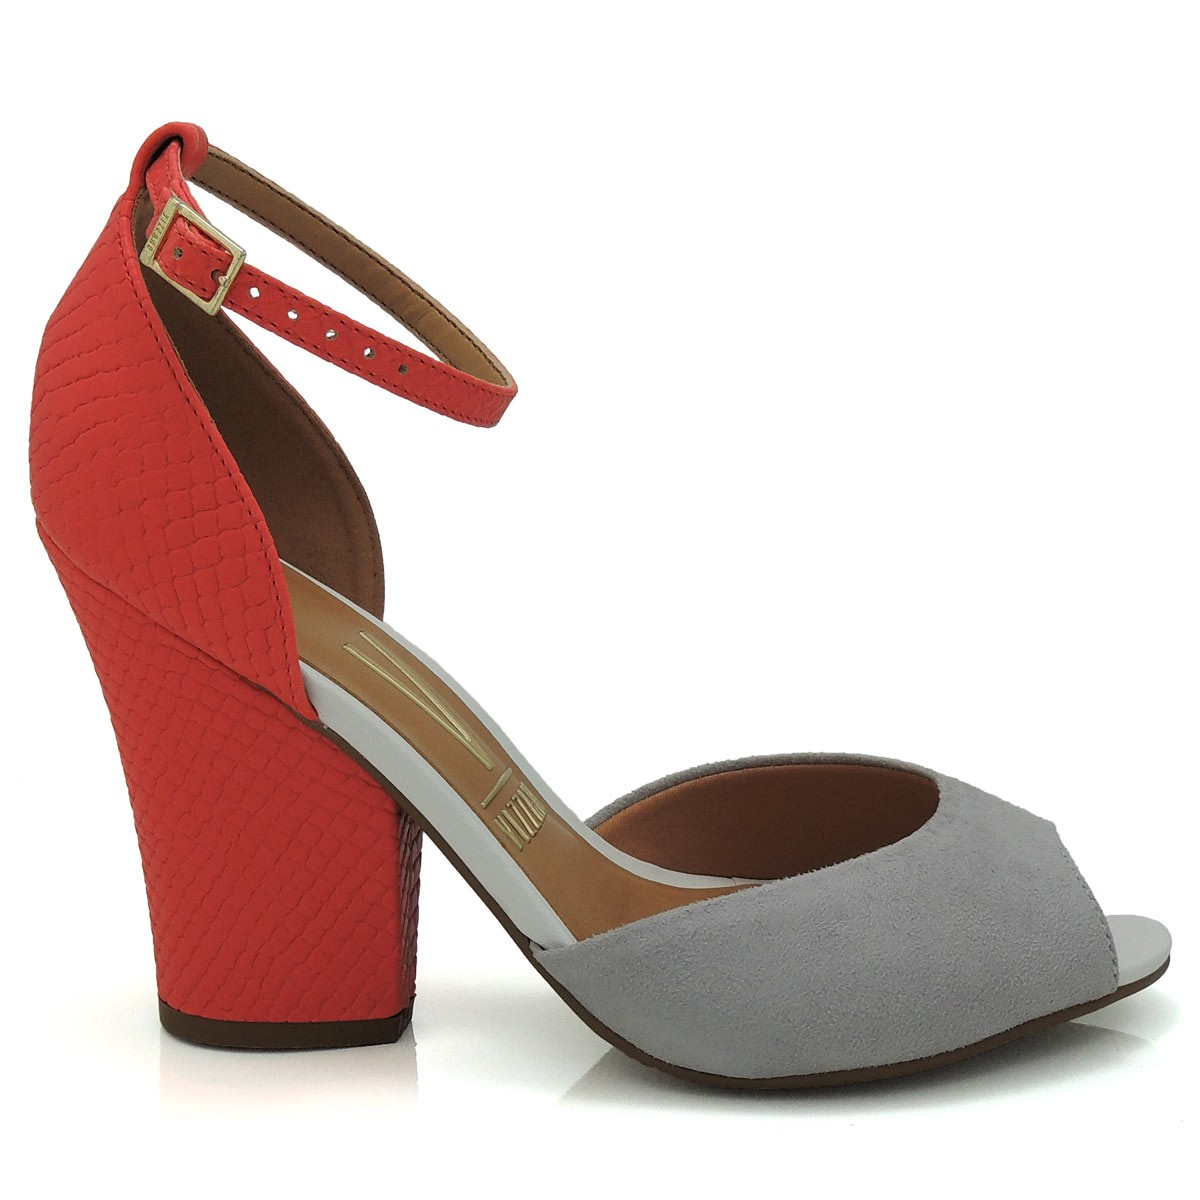 ae20522a2c sandalia-feminina-vizzano-6214232-salto-grosso -2722e24d72dca5c83efd1a3b66edb327.jpg